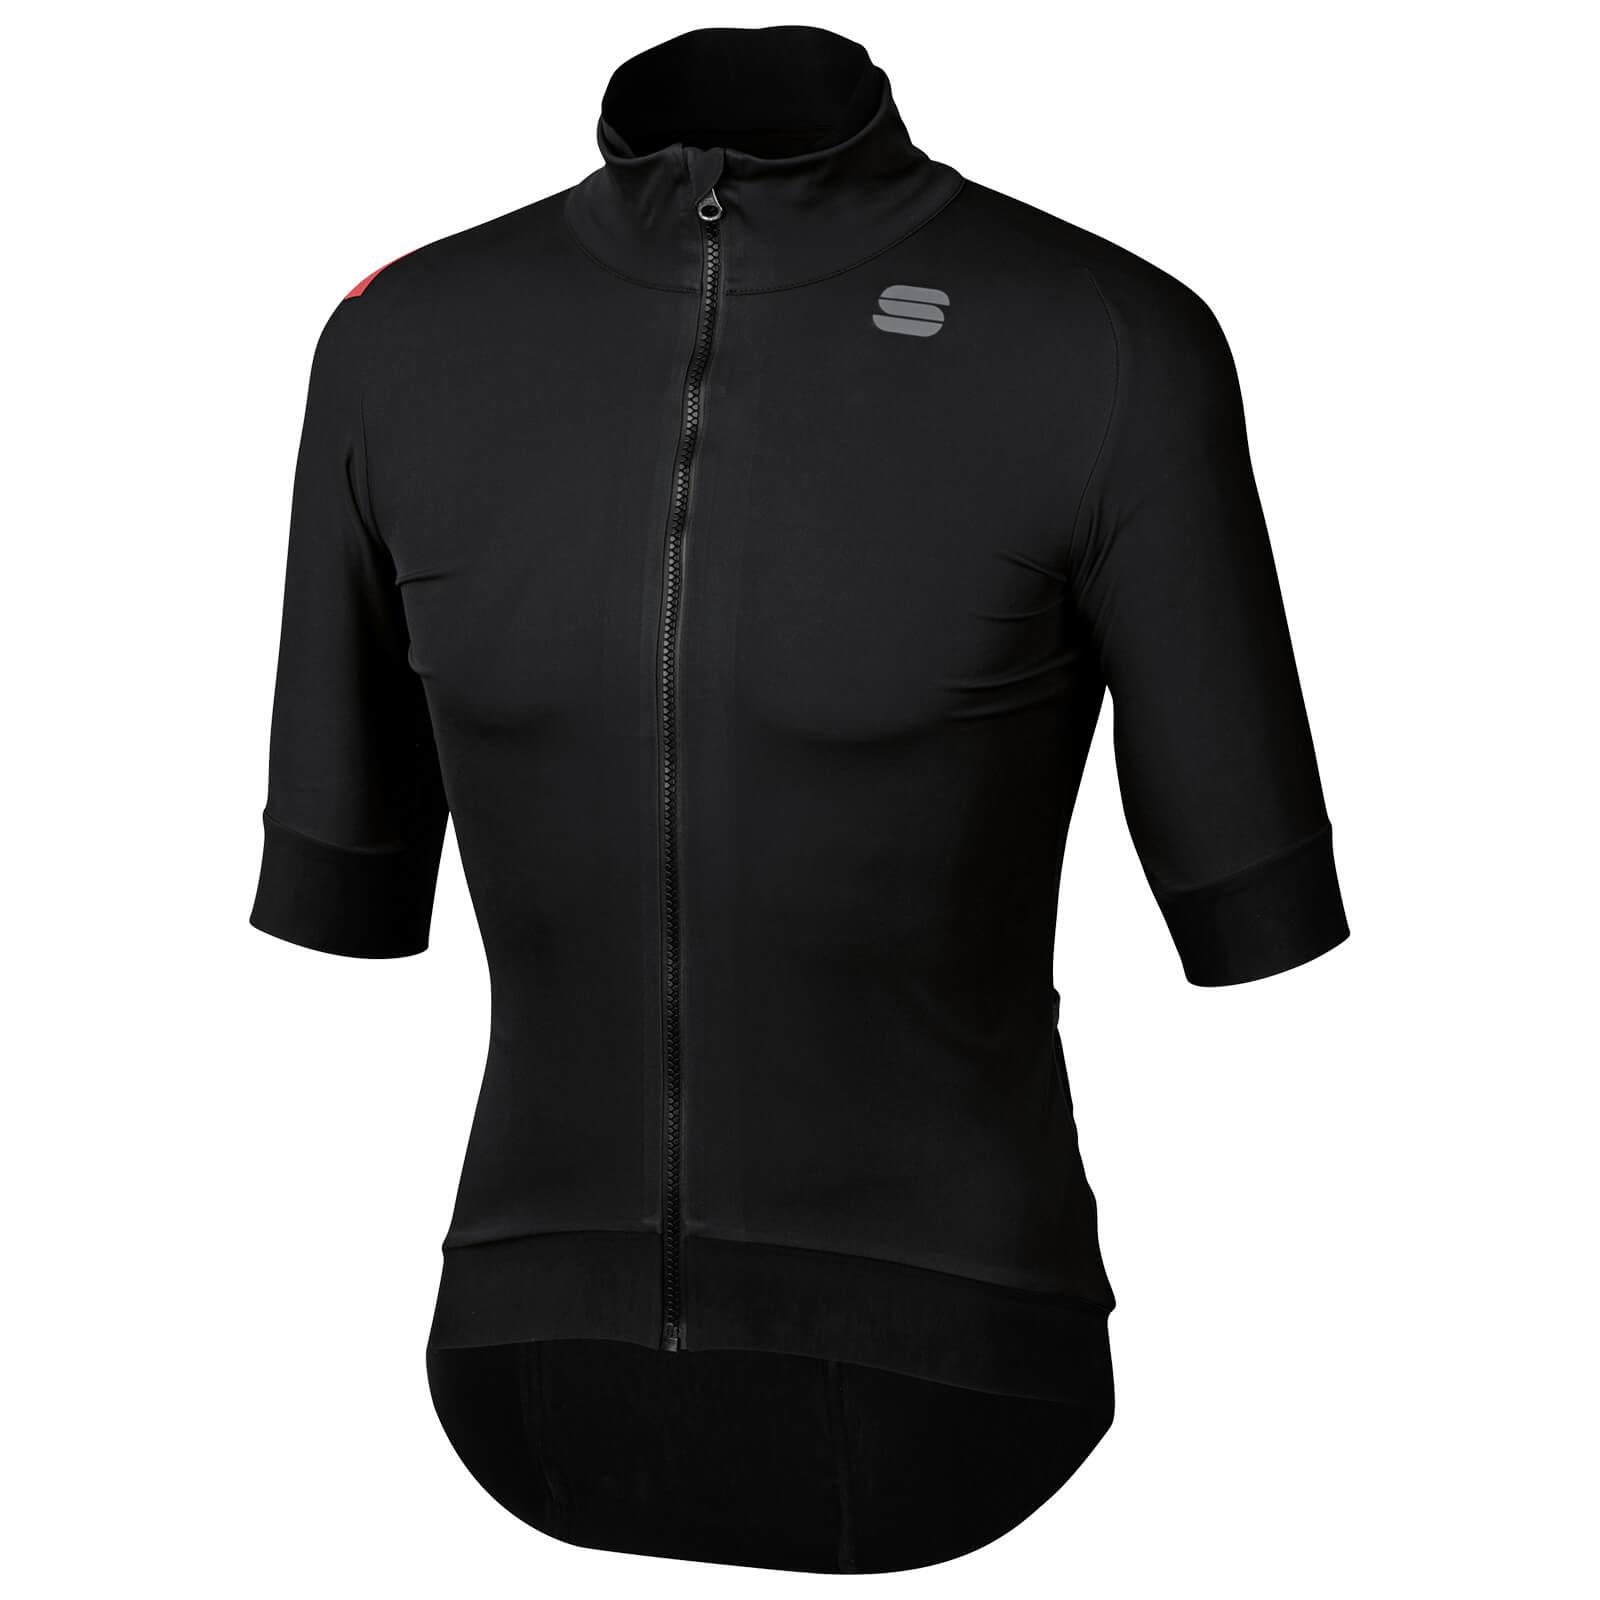 Sportful Fiandre Pro Short Sleeve Jacket - M - Black